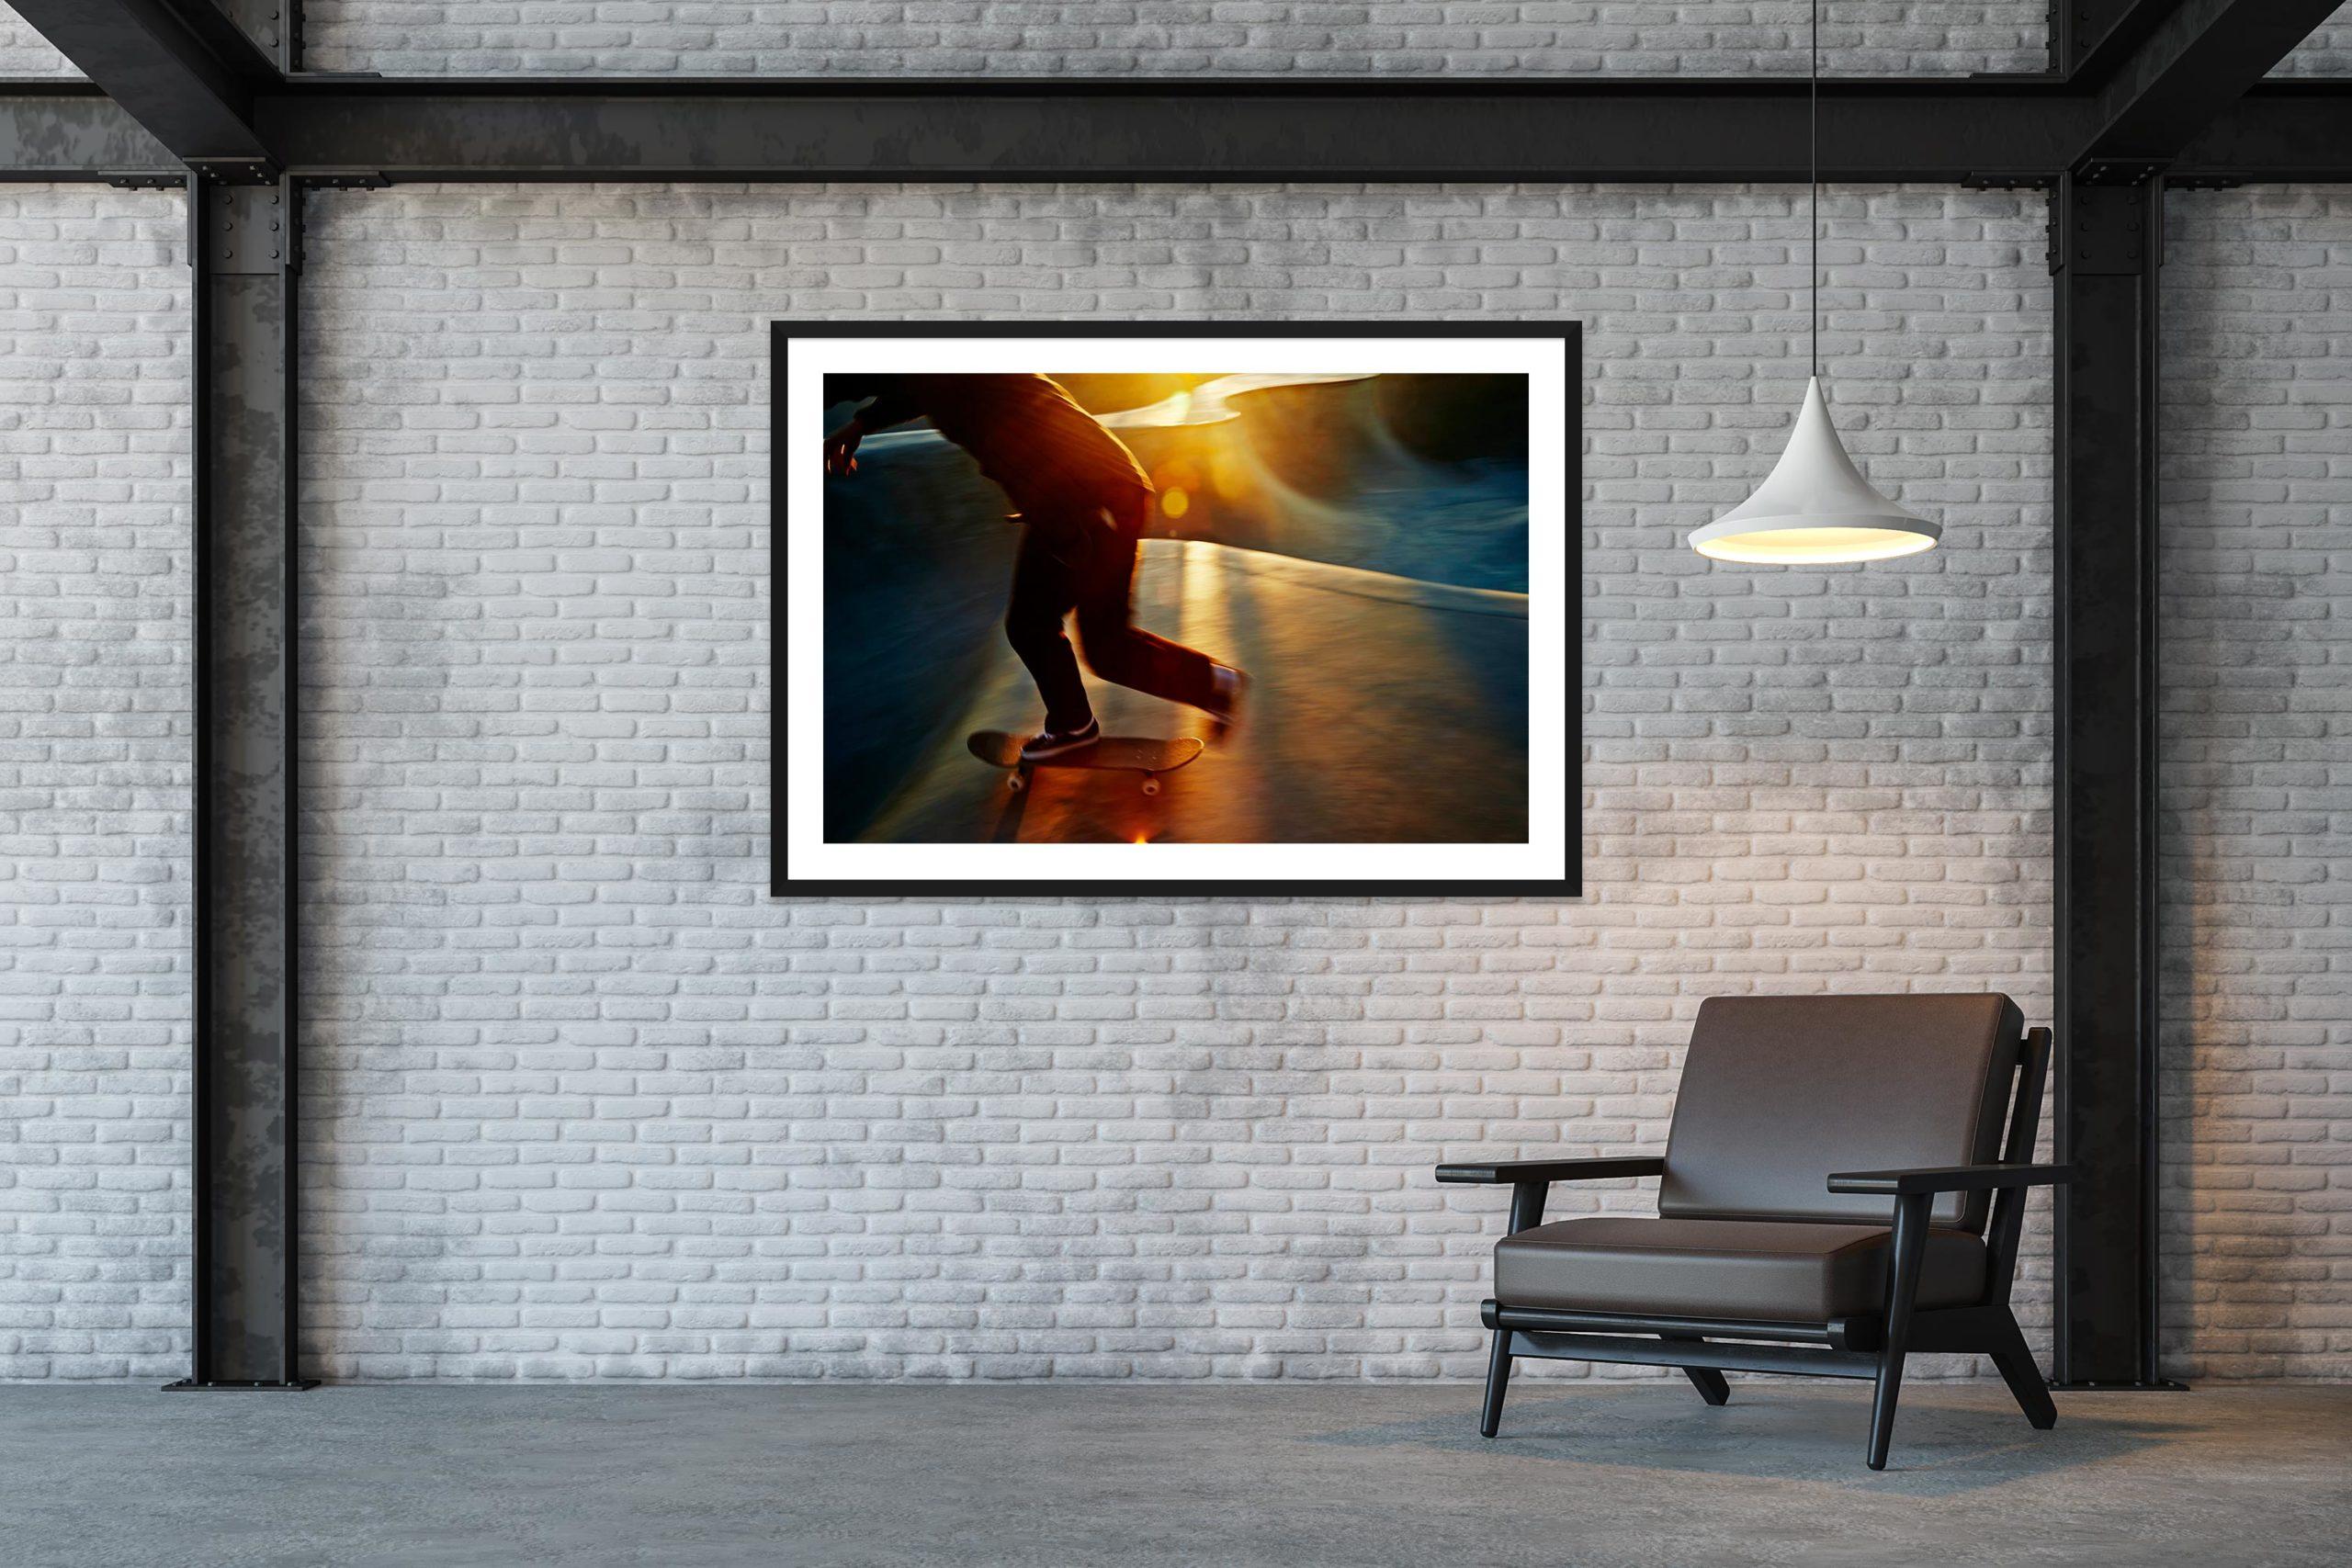 Golden Blur - Black Frame - Skate Park, Venice Beach Collection - Fine Art Photography by Toby Dixon